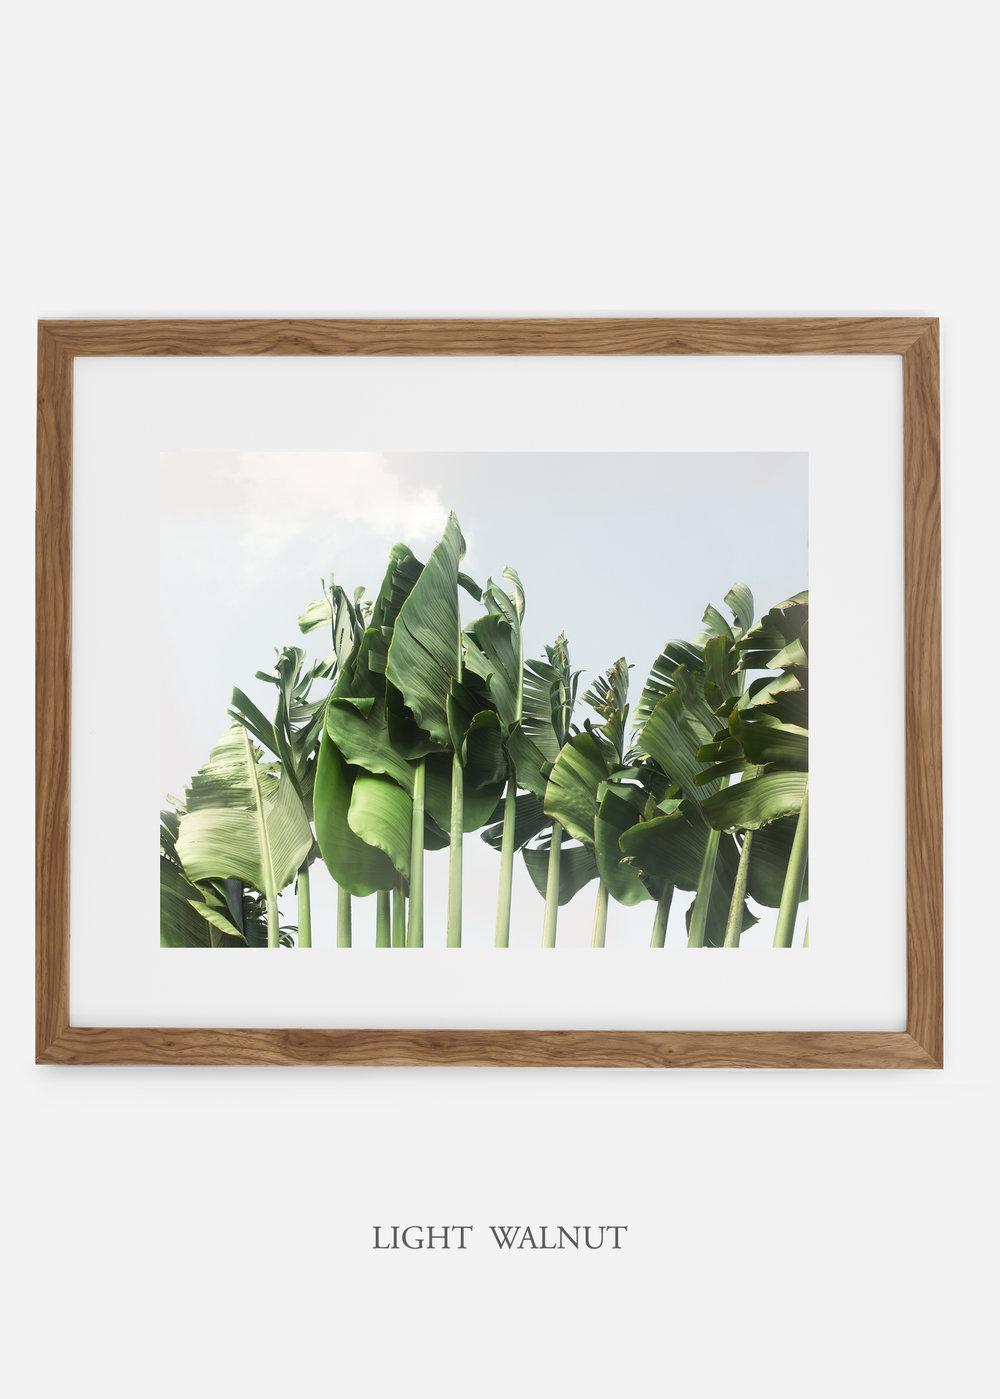 wildercalifornia_lightwalnutframe_tulum_bananaleaf_No.1_minimal_cactus_art_interiordesign_blackandwhite.jpg